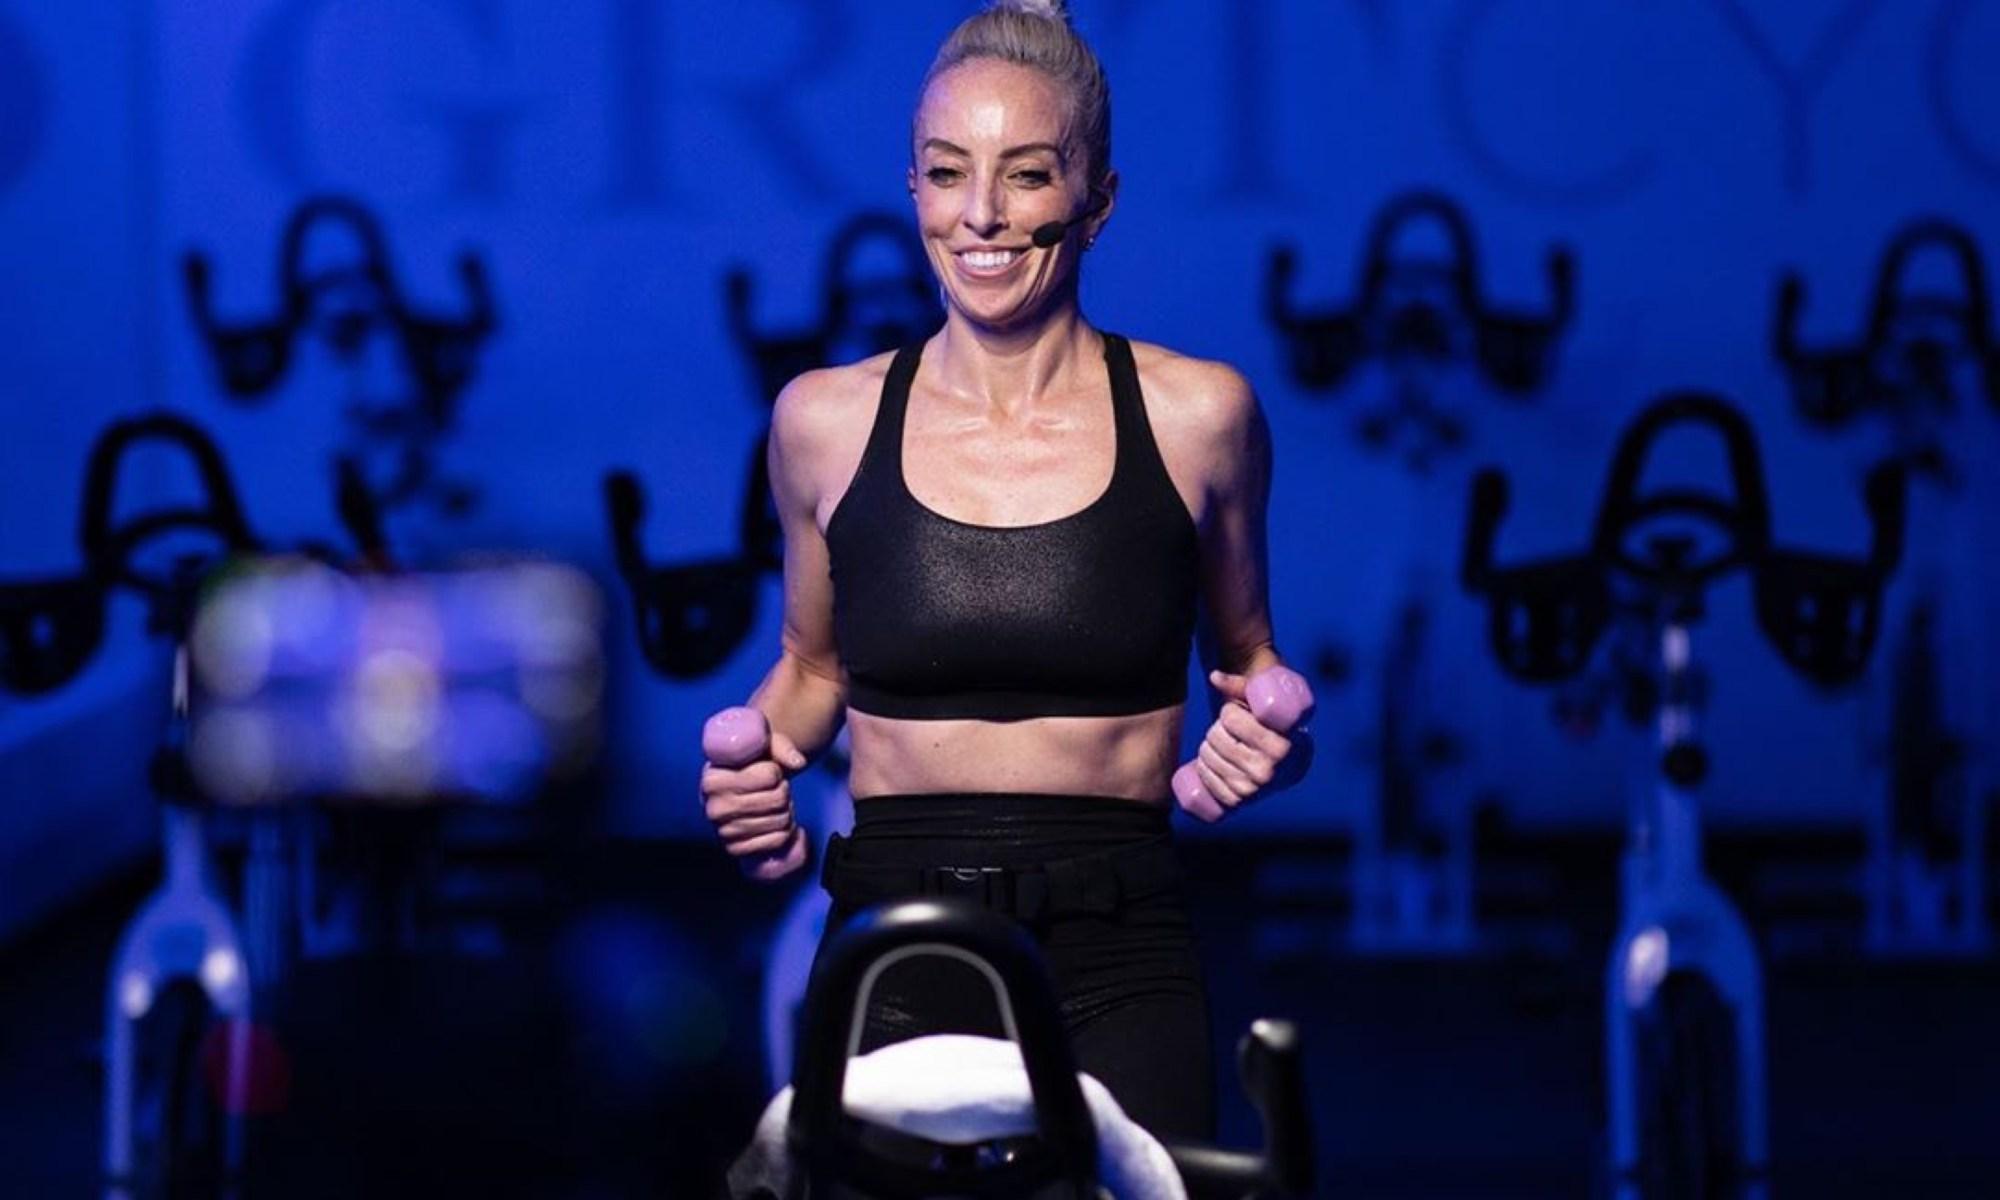 Orange County Fitness Studios Offer Live Stream